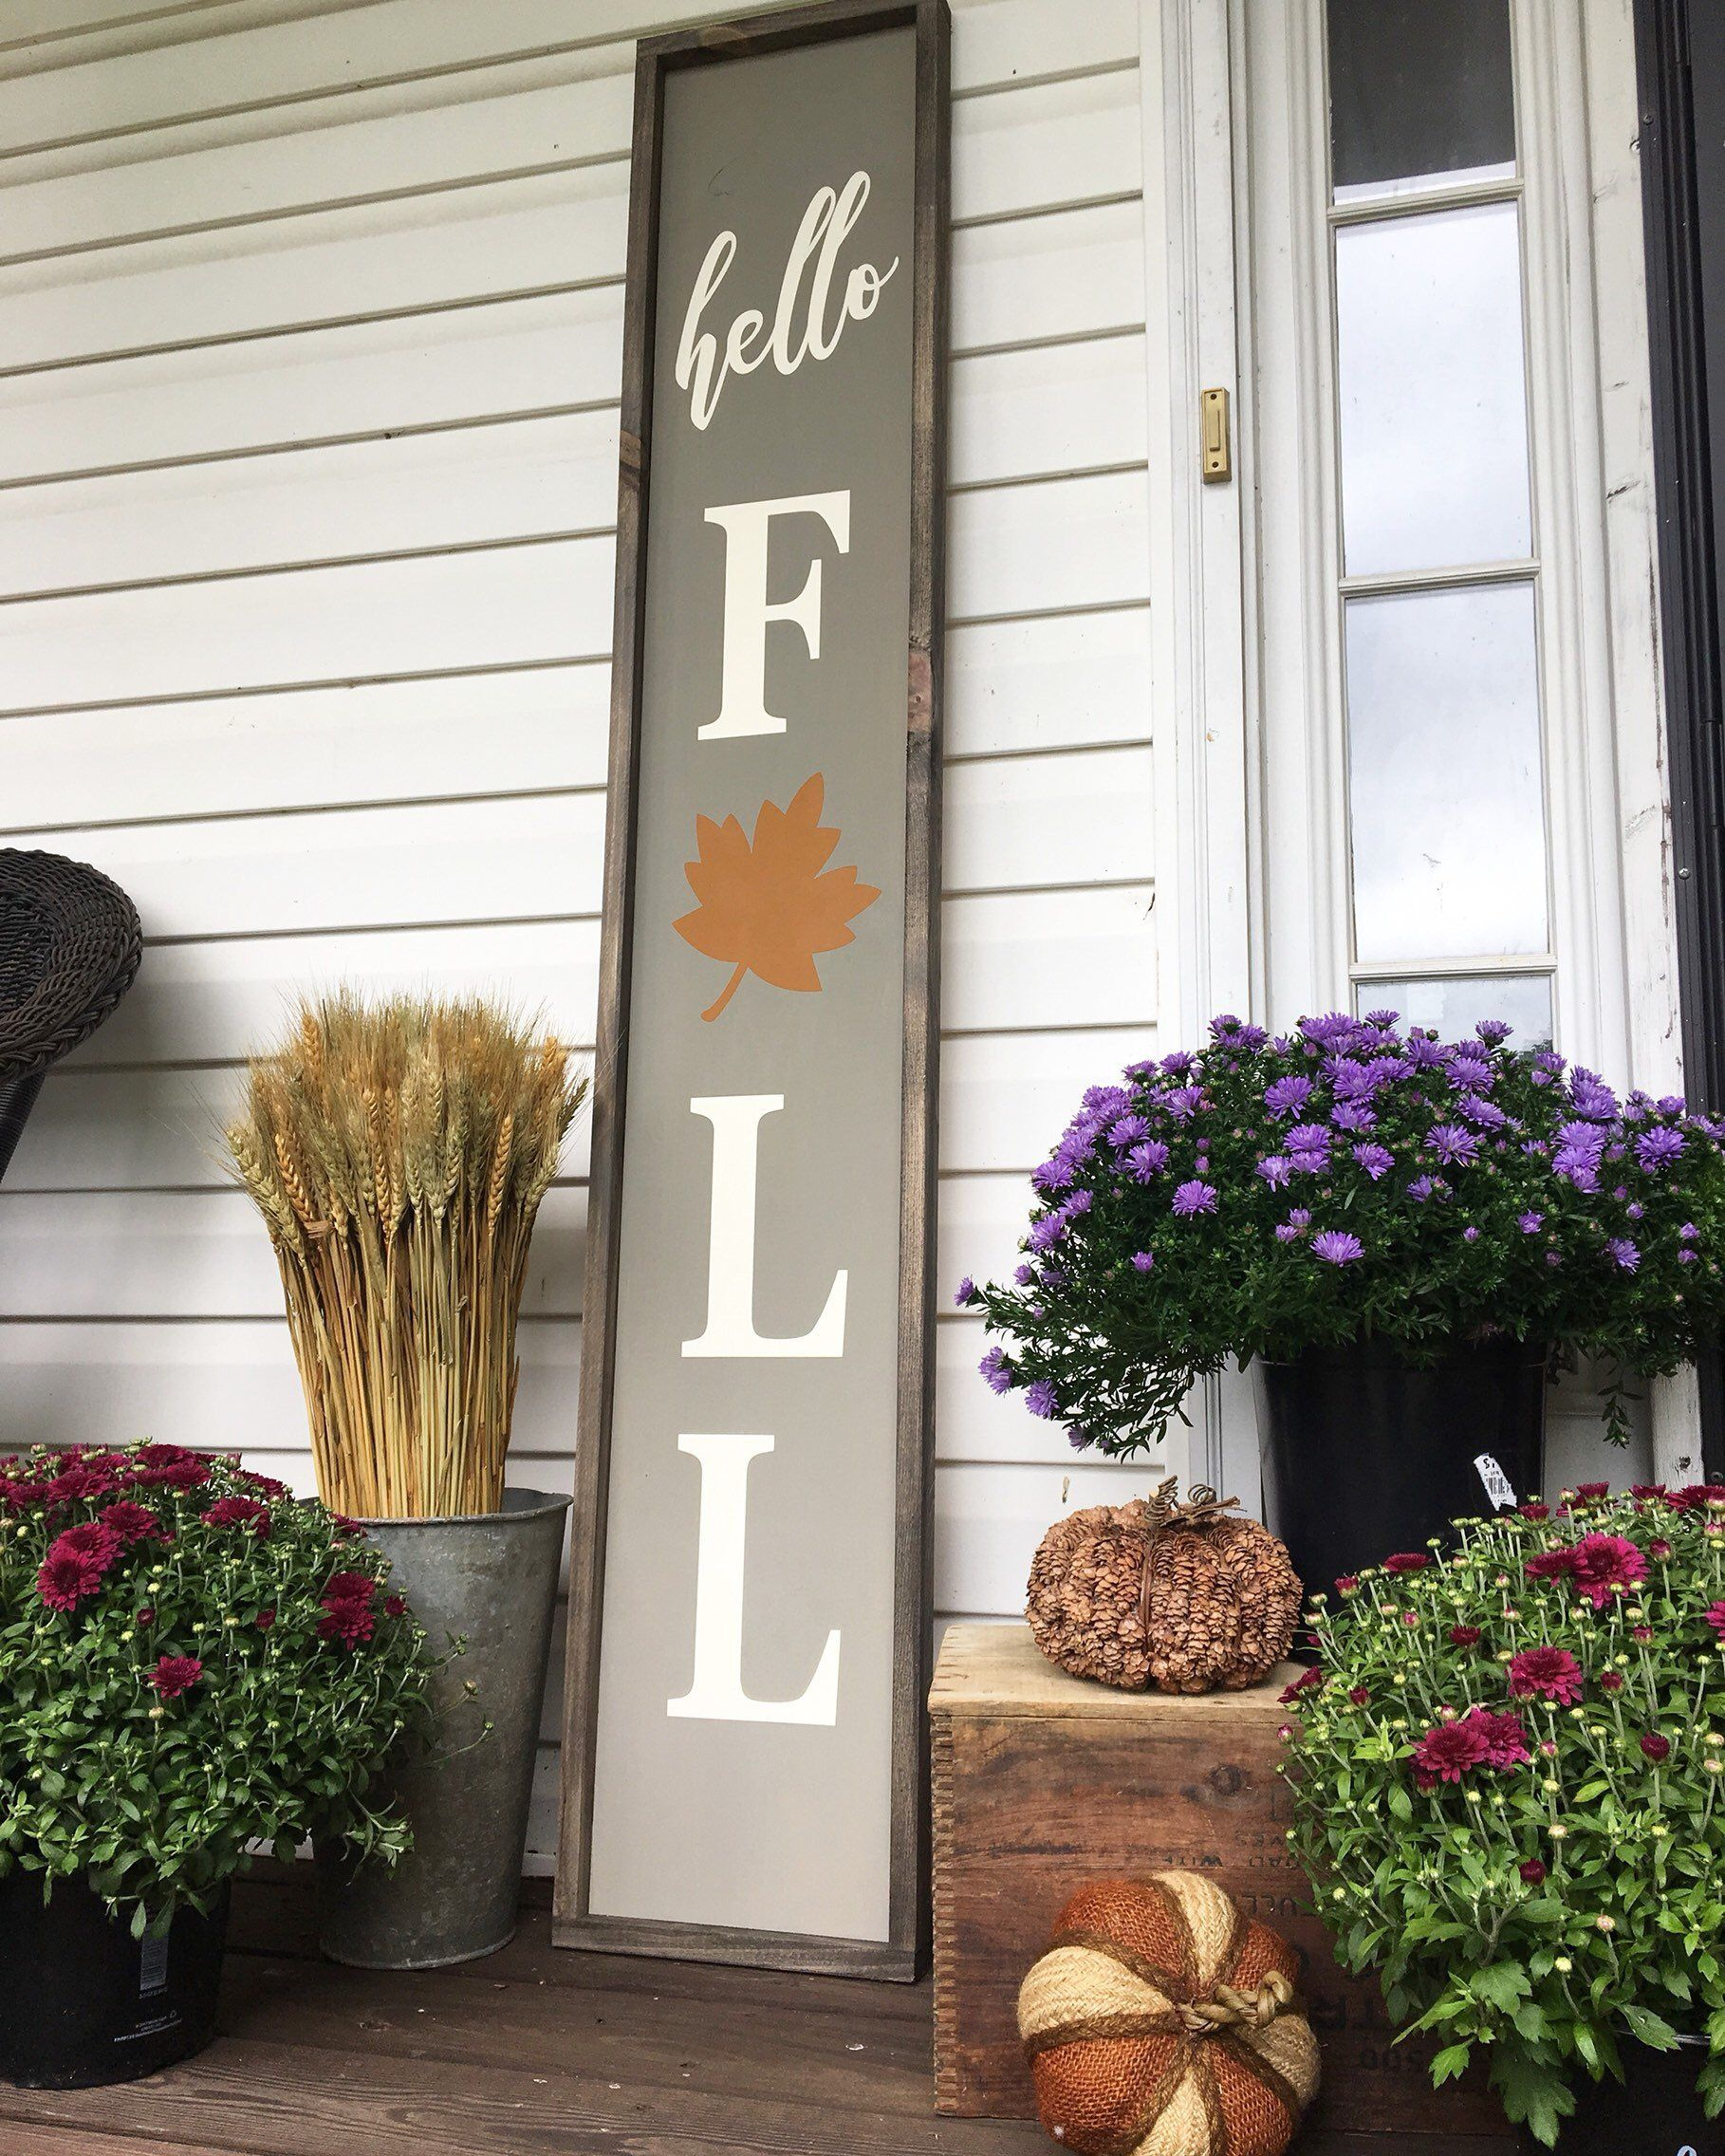 Hello Fall Fall Wood Sign Fall Decor Porch Signs Pumpkin Signs Hello Fall Sign Wood Signs Fall Wood Signs Fall Decorations Porch Fall Decor